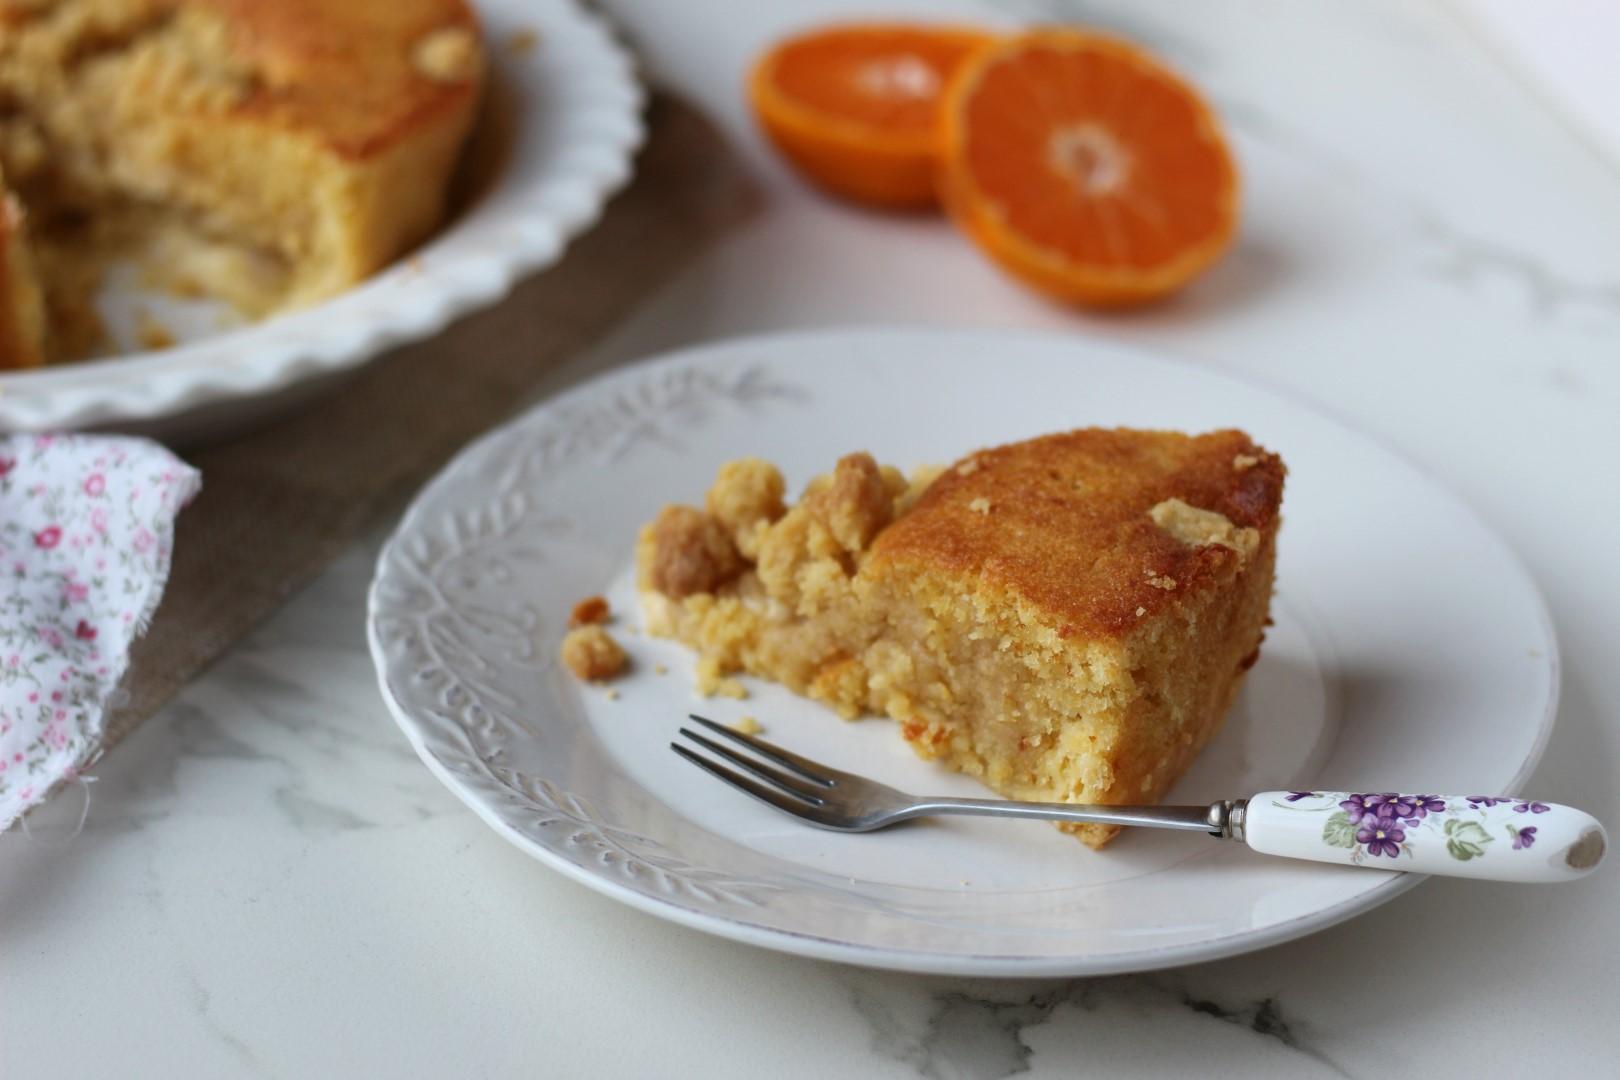 torta crocante crumble cheesecake , queso crema casancrem, recetas de cocina, torta, recetas dulces, tips de cocina, recetas simples, recetas merienda, hora del té.